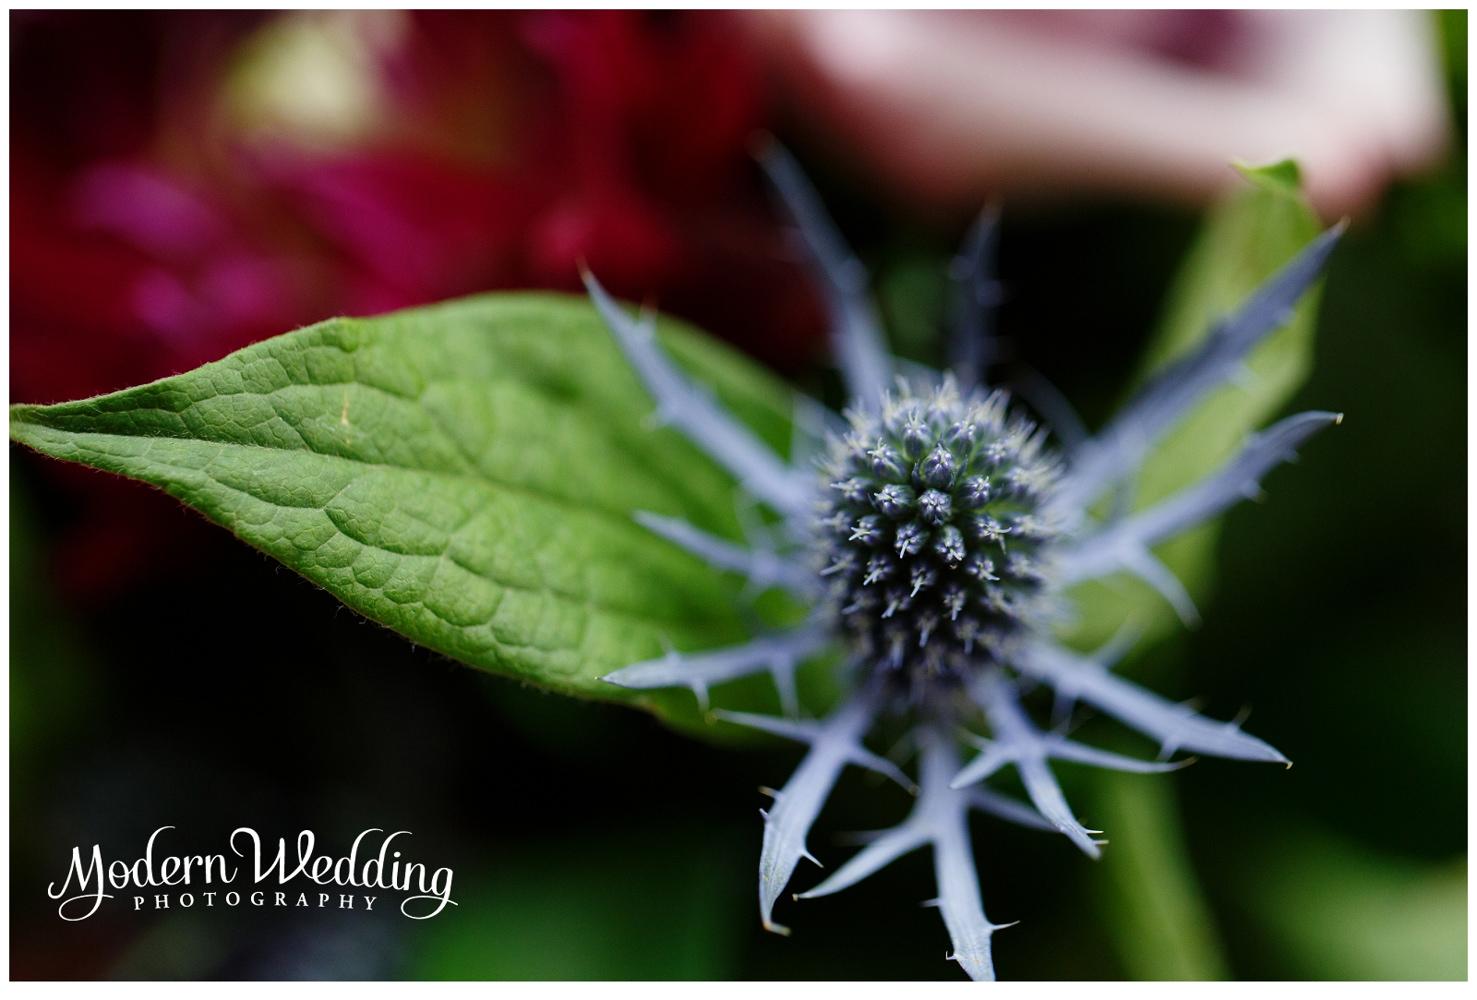 Modern Wedding Photography 56